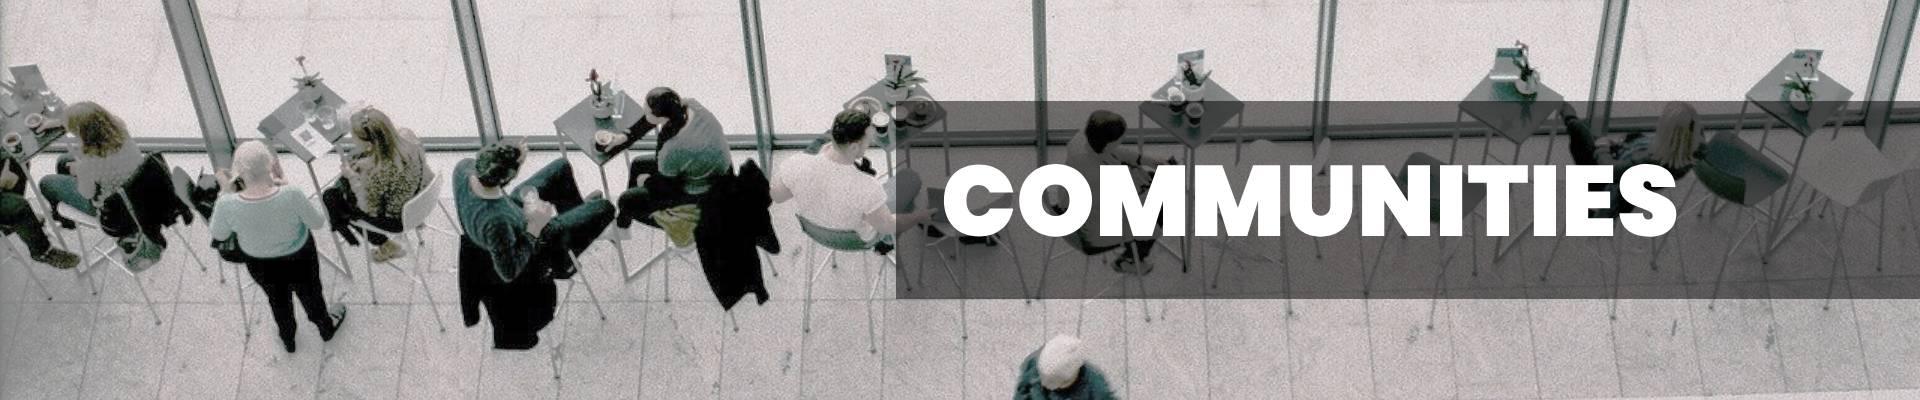 communities2